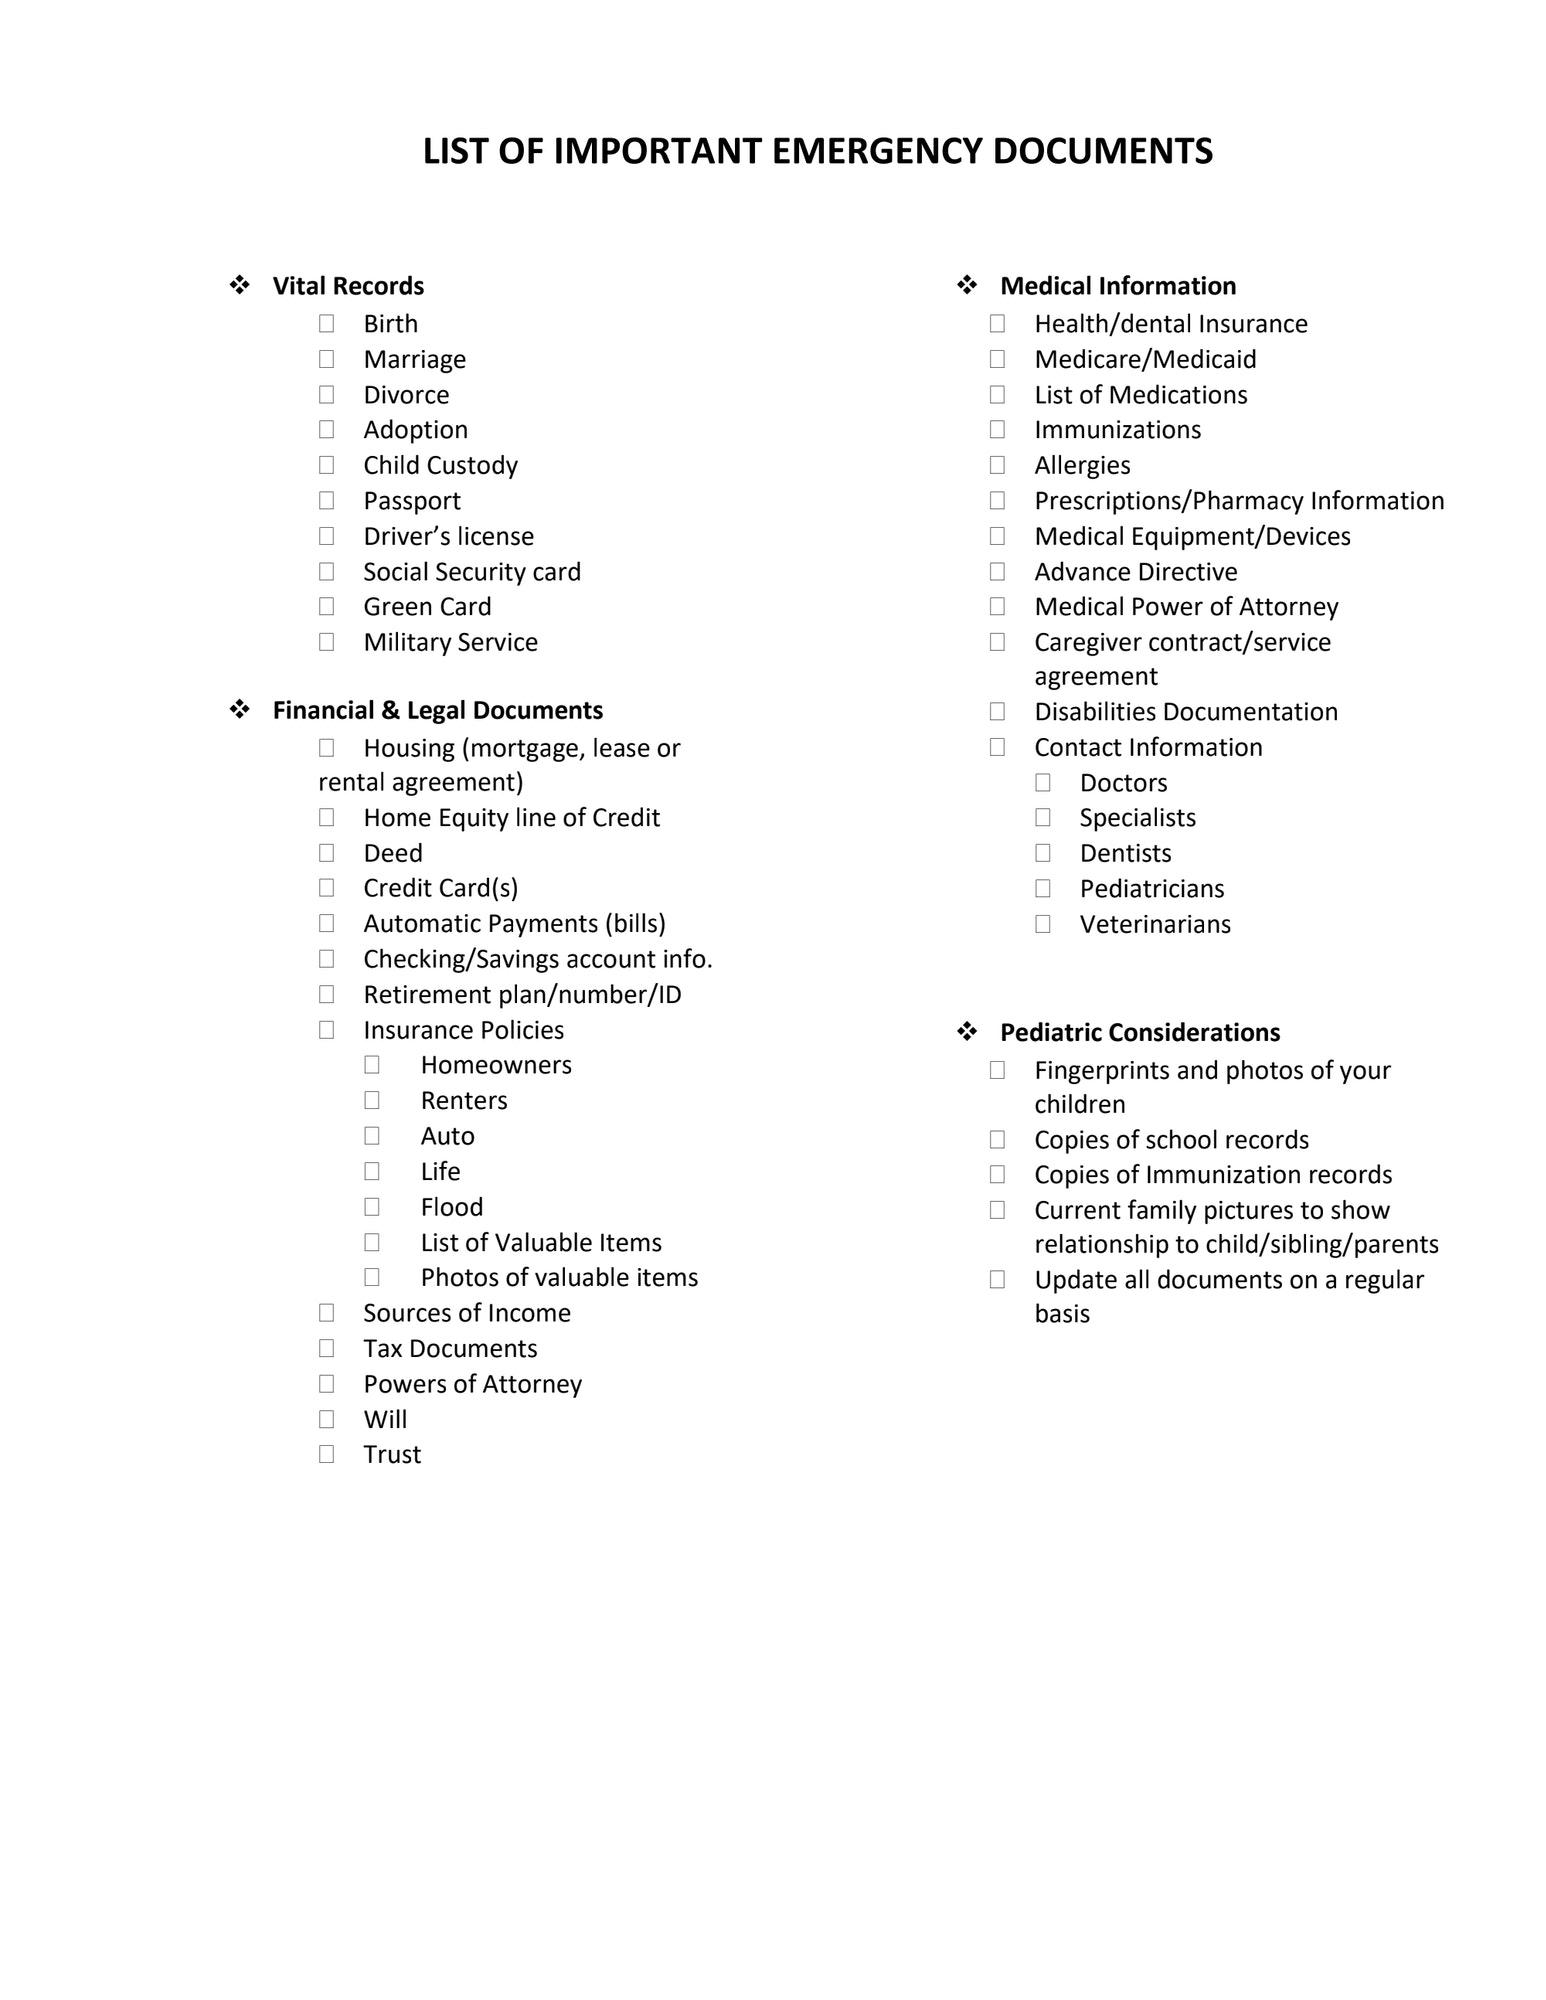 Important Documents List